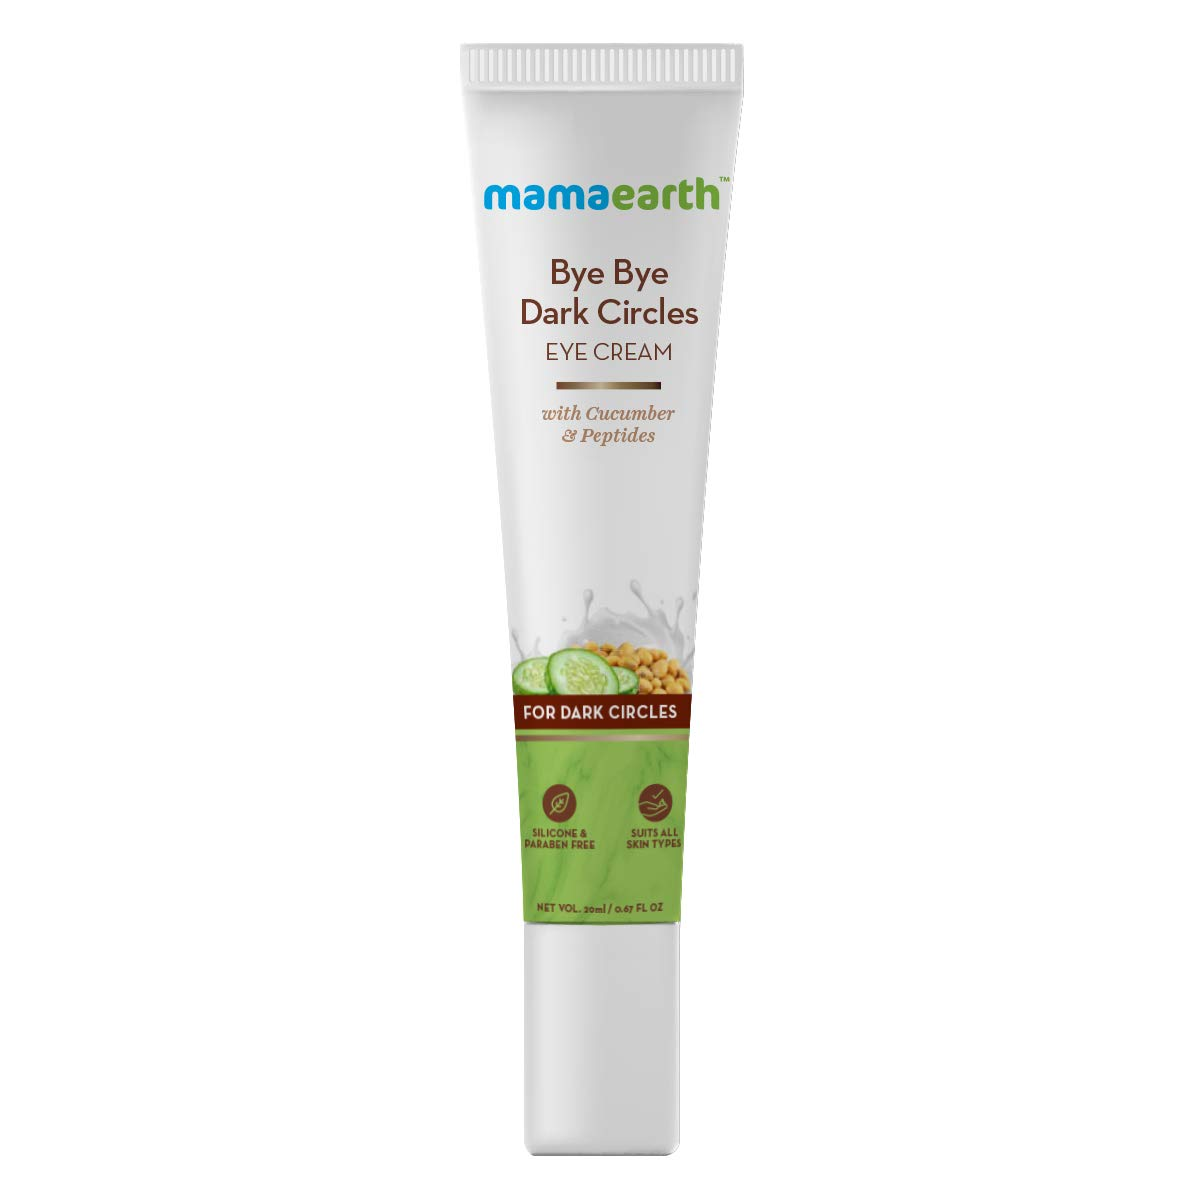 Mamaearth Bye Bye Dark Circles Eye Cream Best Under Eye Creams in India